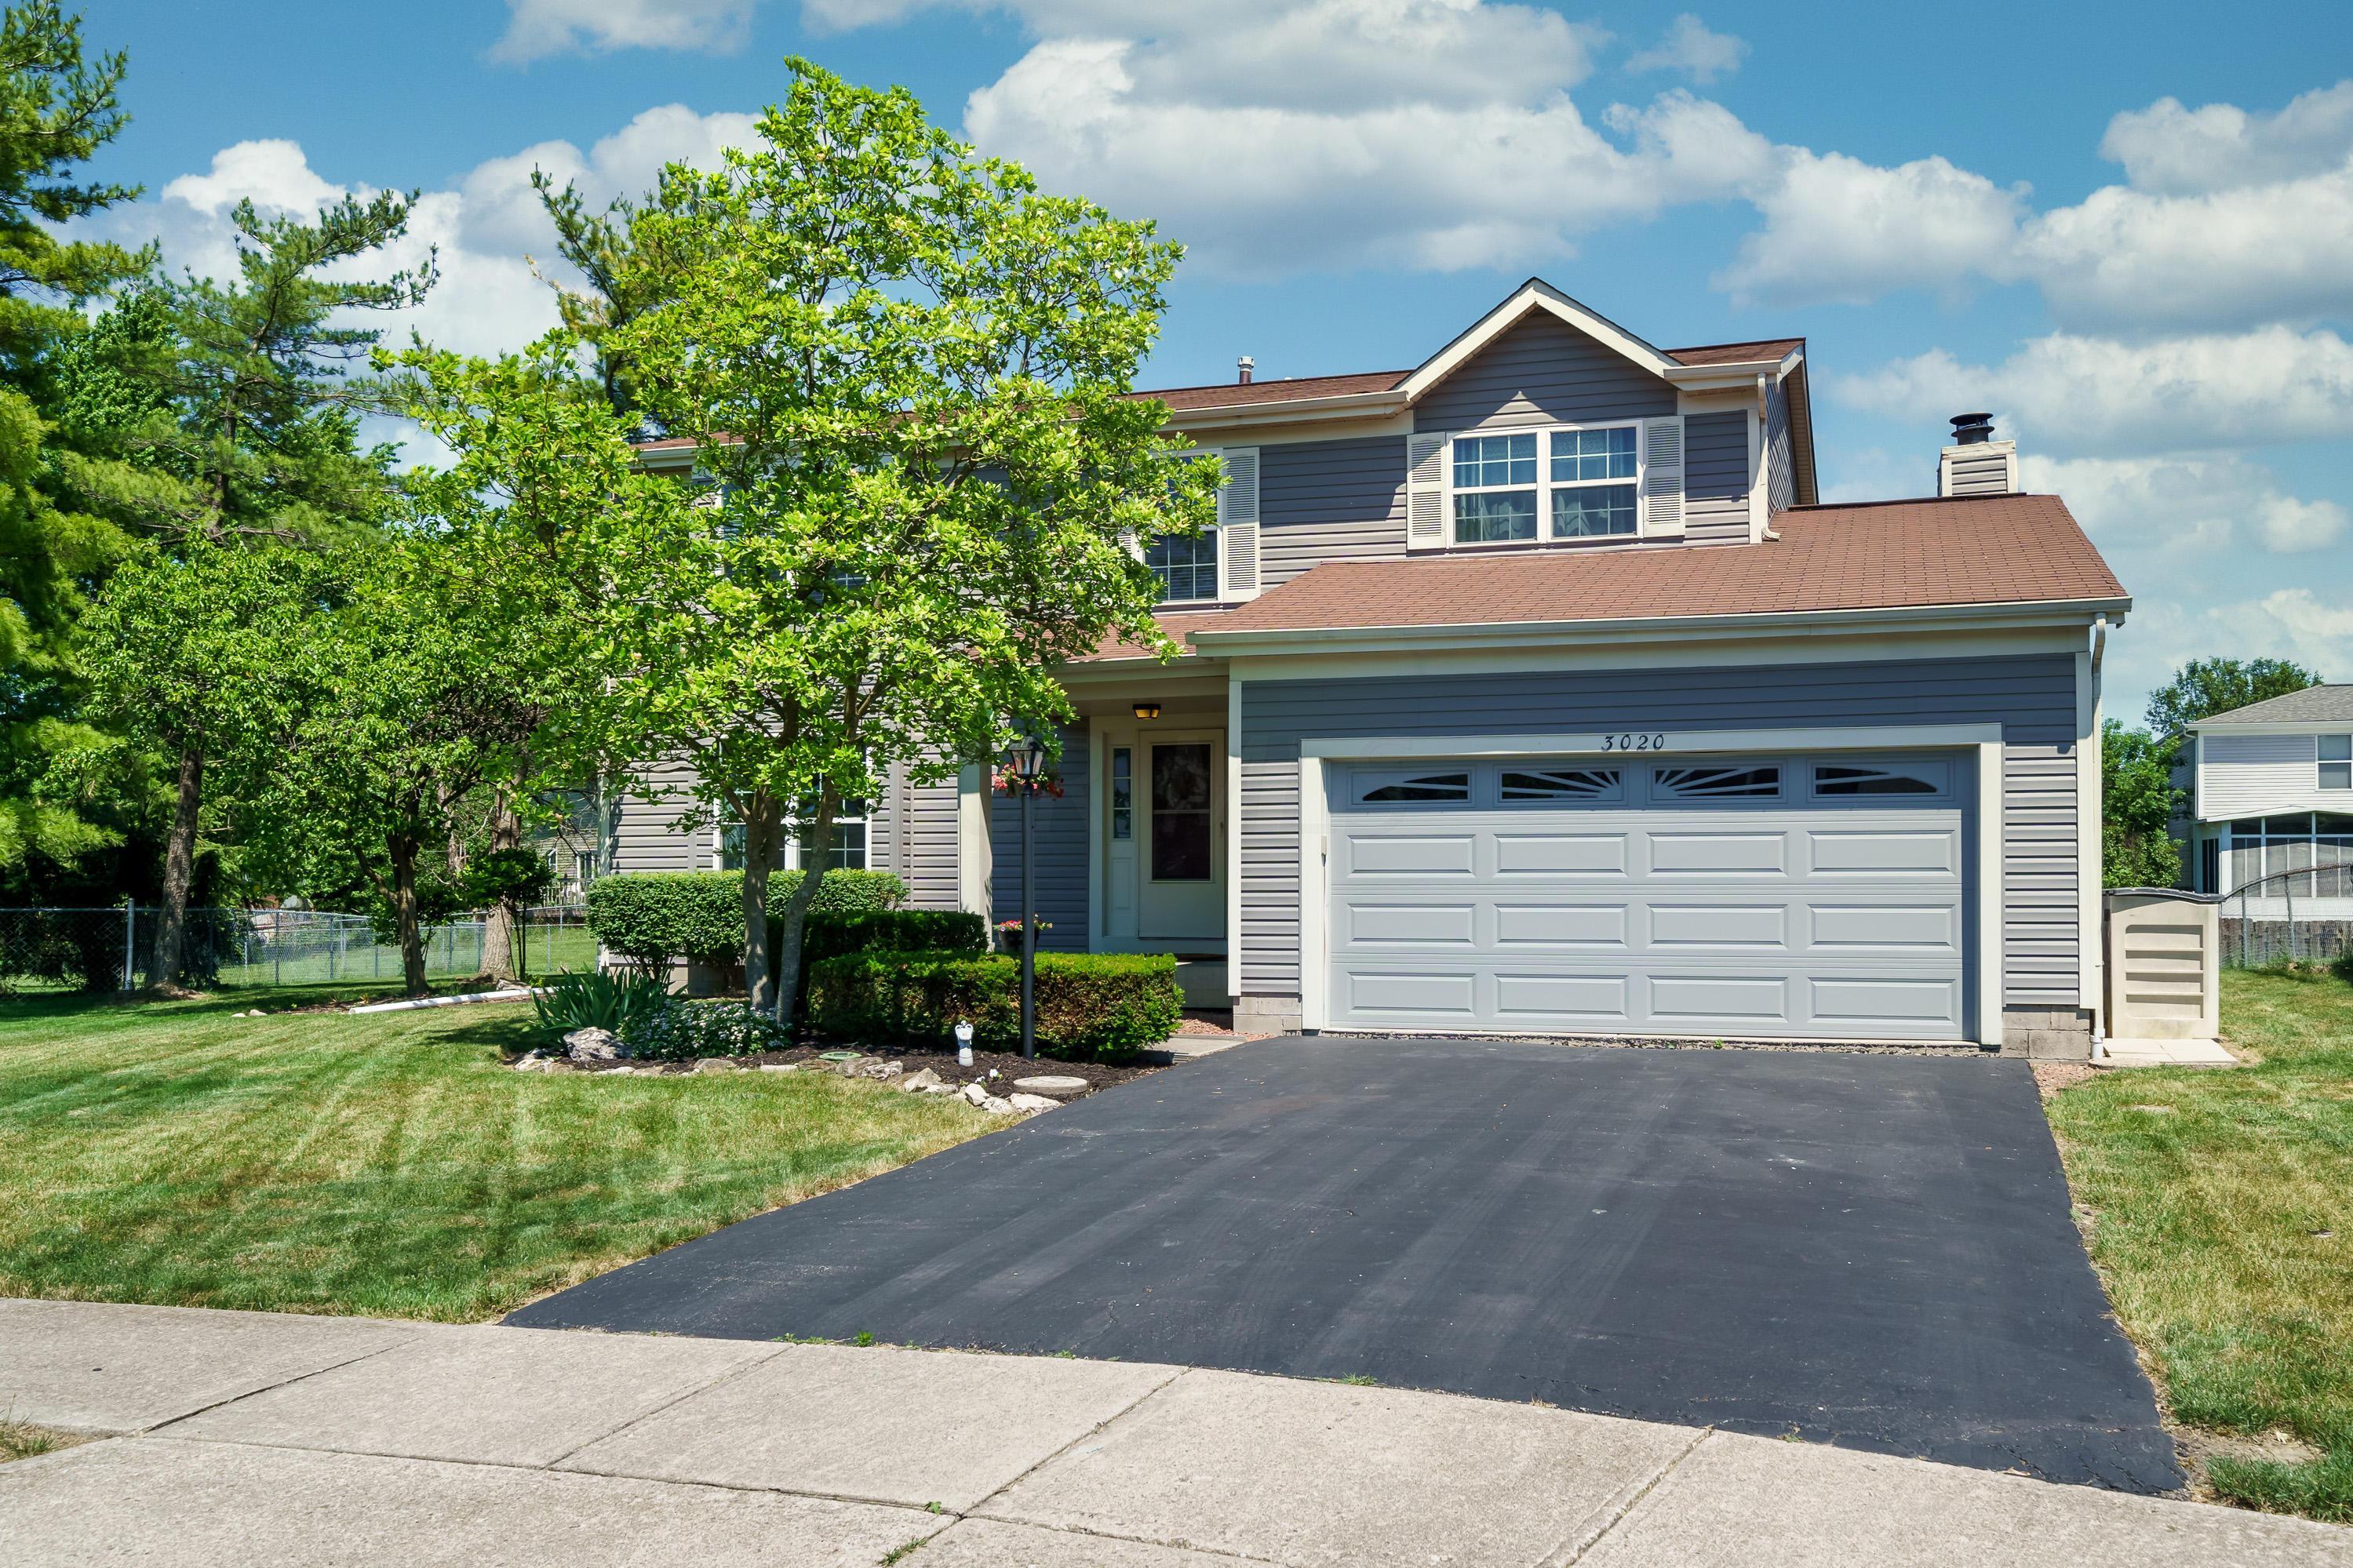 3020 Tempe Court, Hilliard, Ohio 43026, 3 Bedrooms Bedrooms, ,3 BathroomsBathrooms,Residential,For Sale,Tempe,220018713